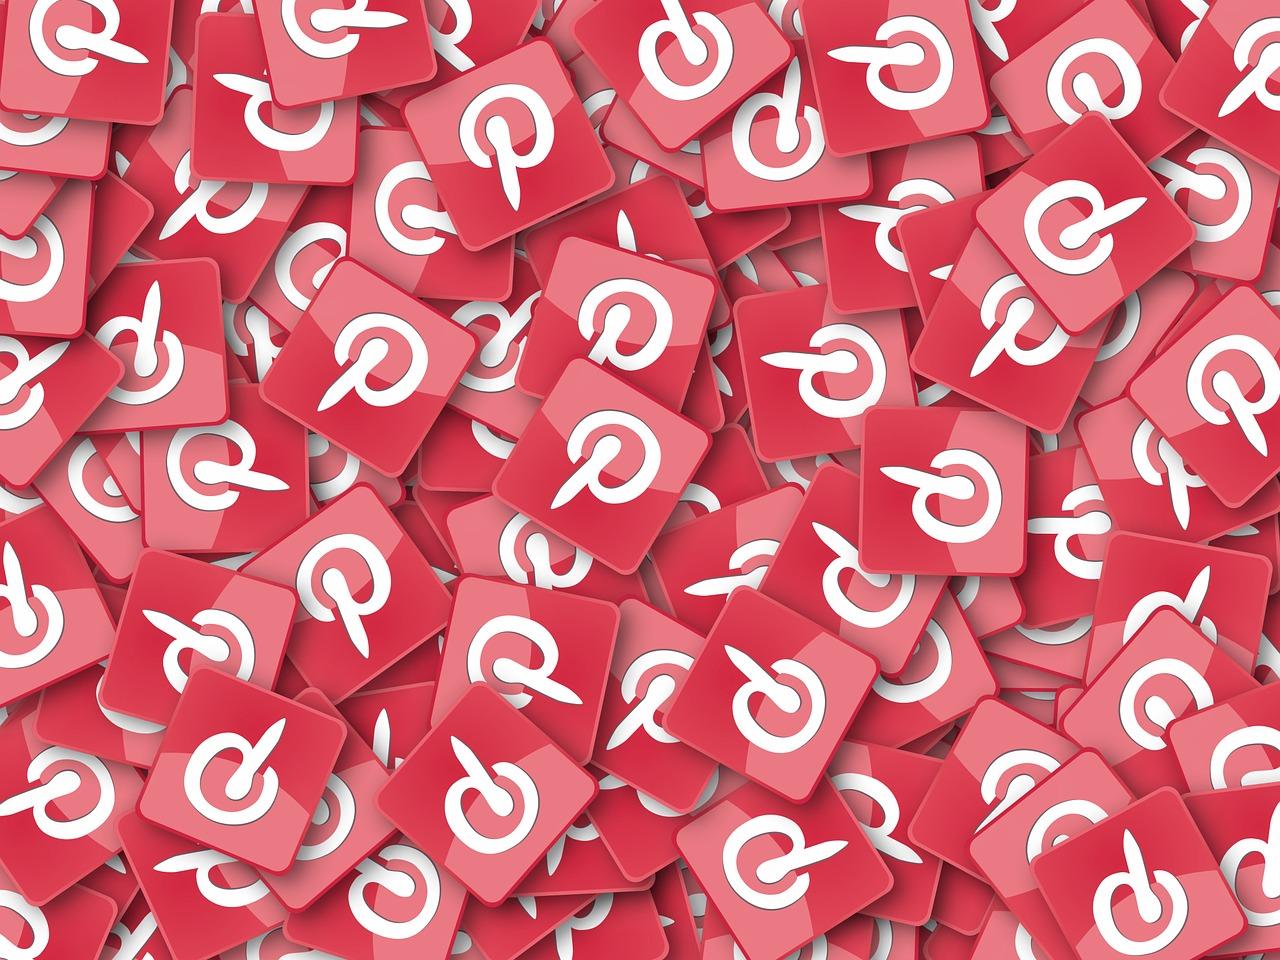 5 maneras creativas de usar Pinterest – Laura Tejerina